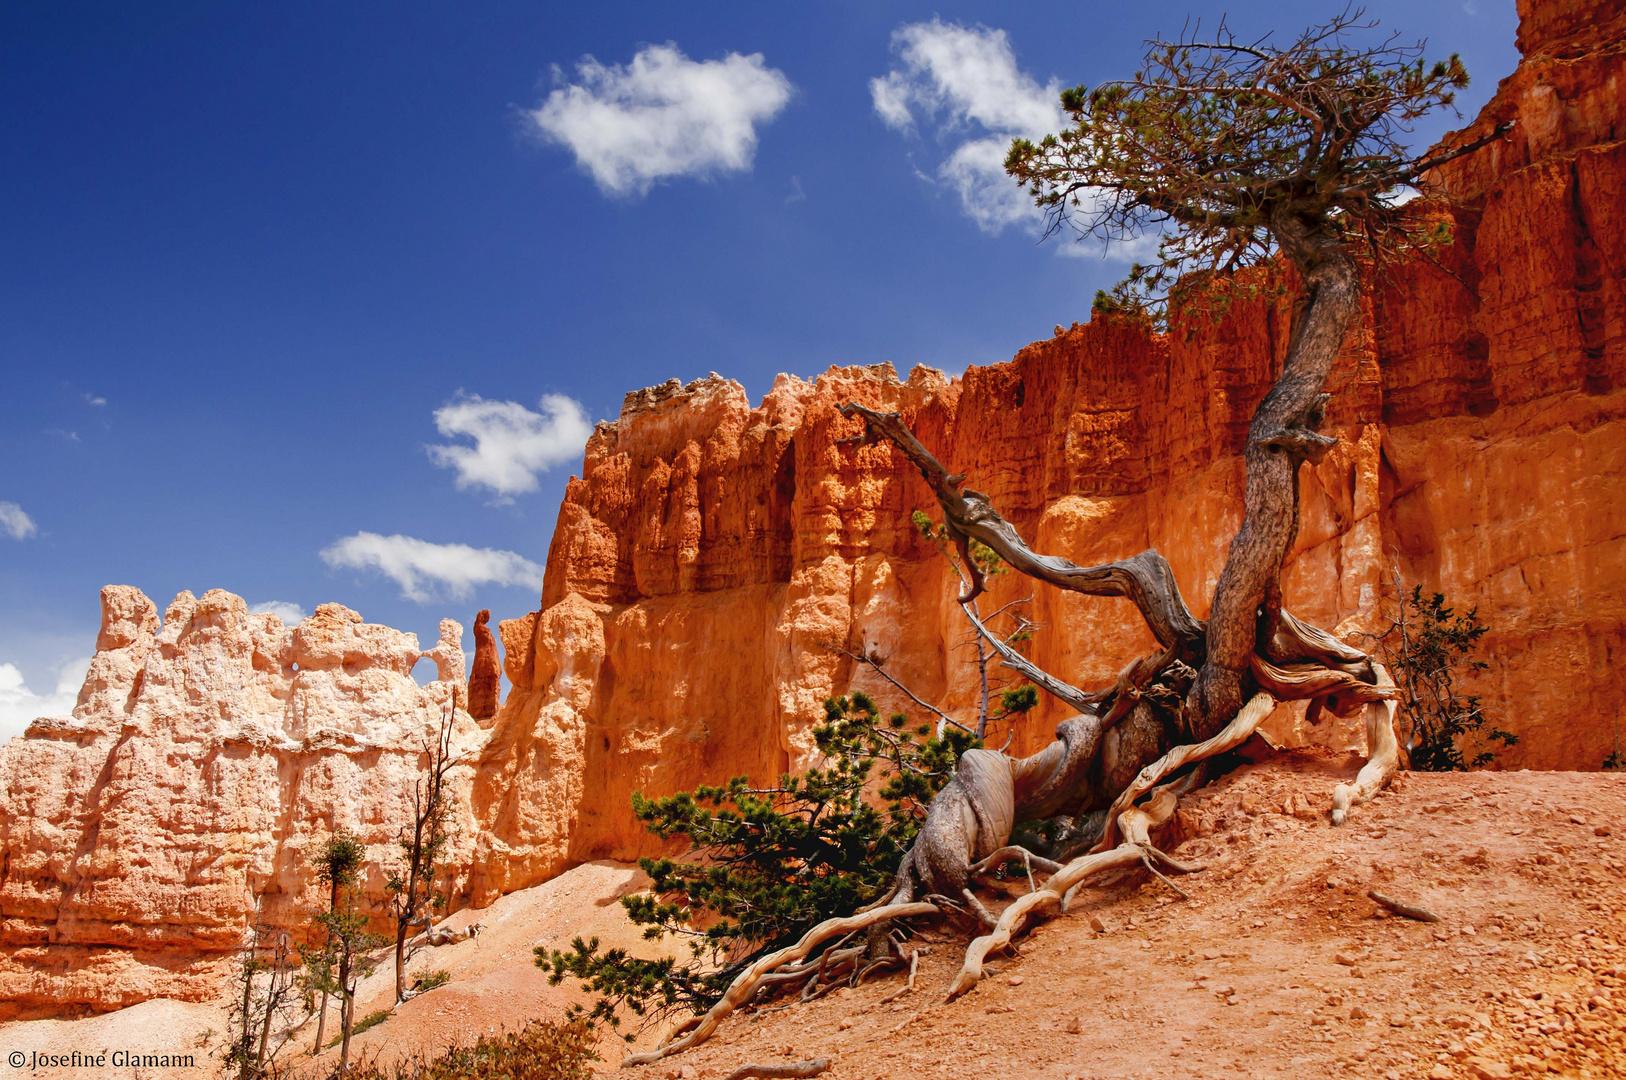 Easygoing Tree